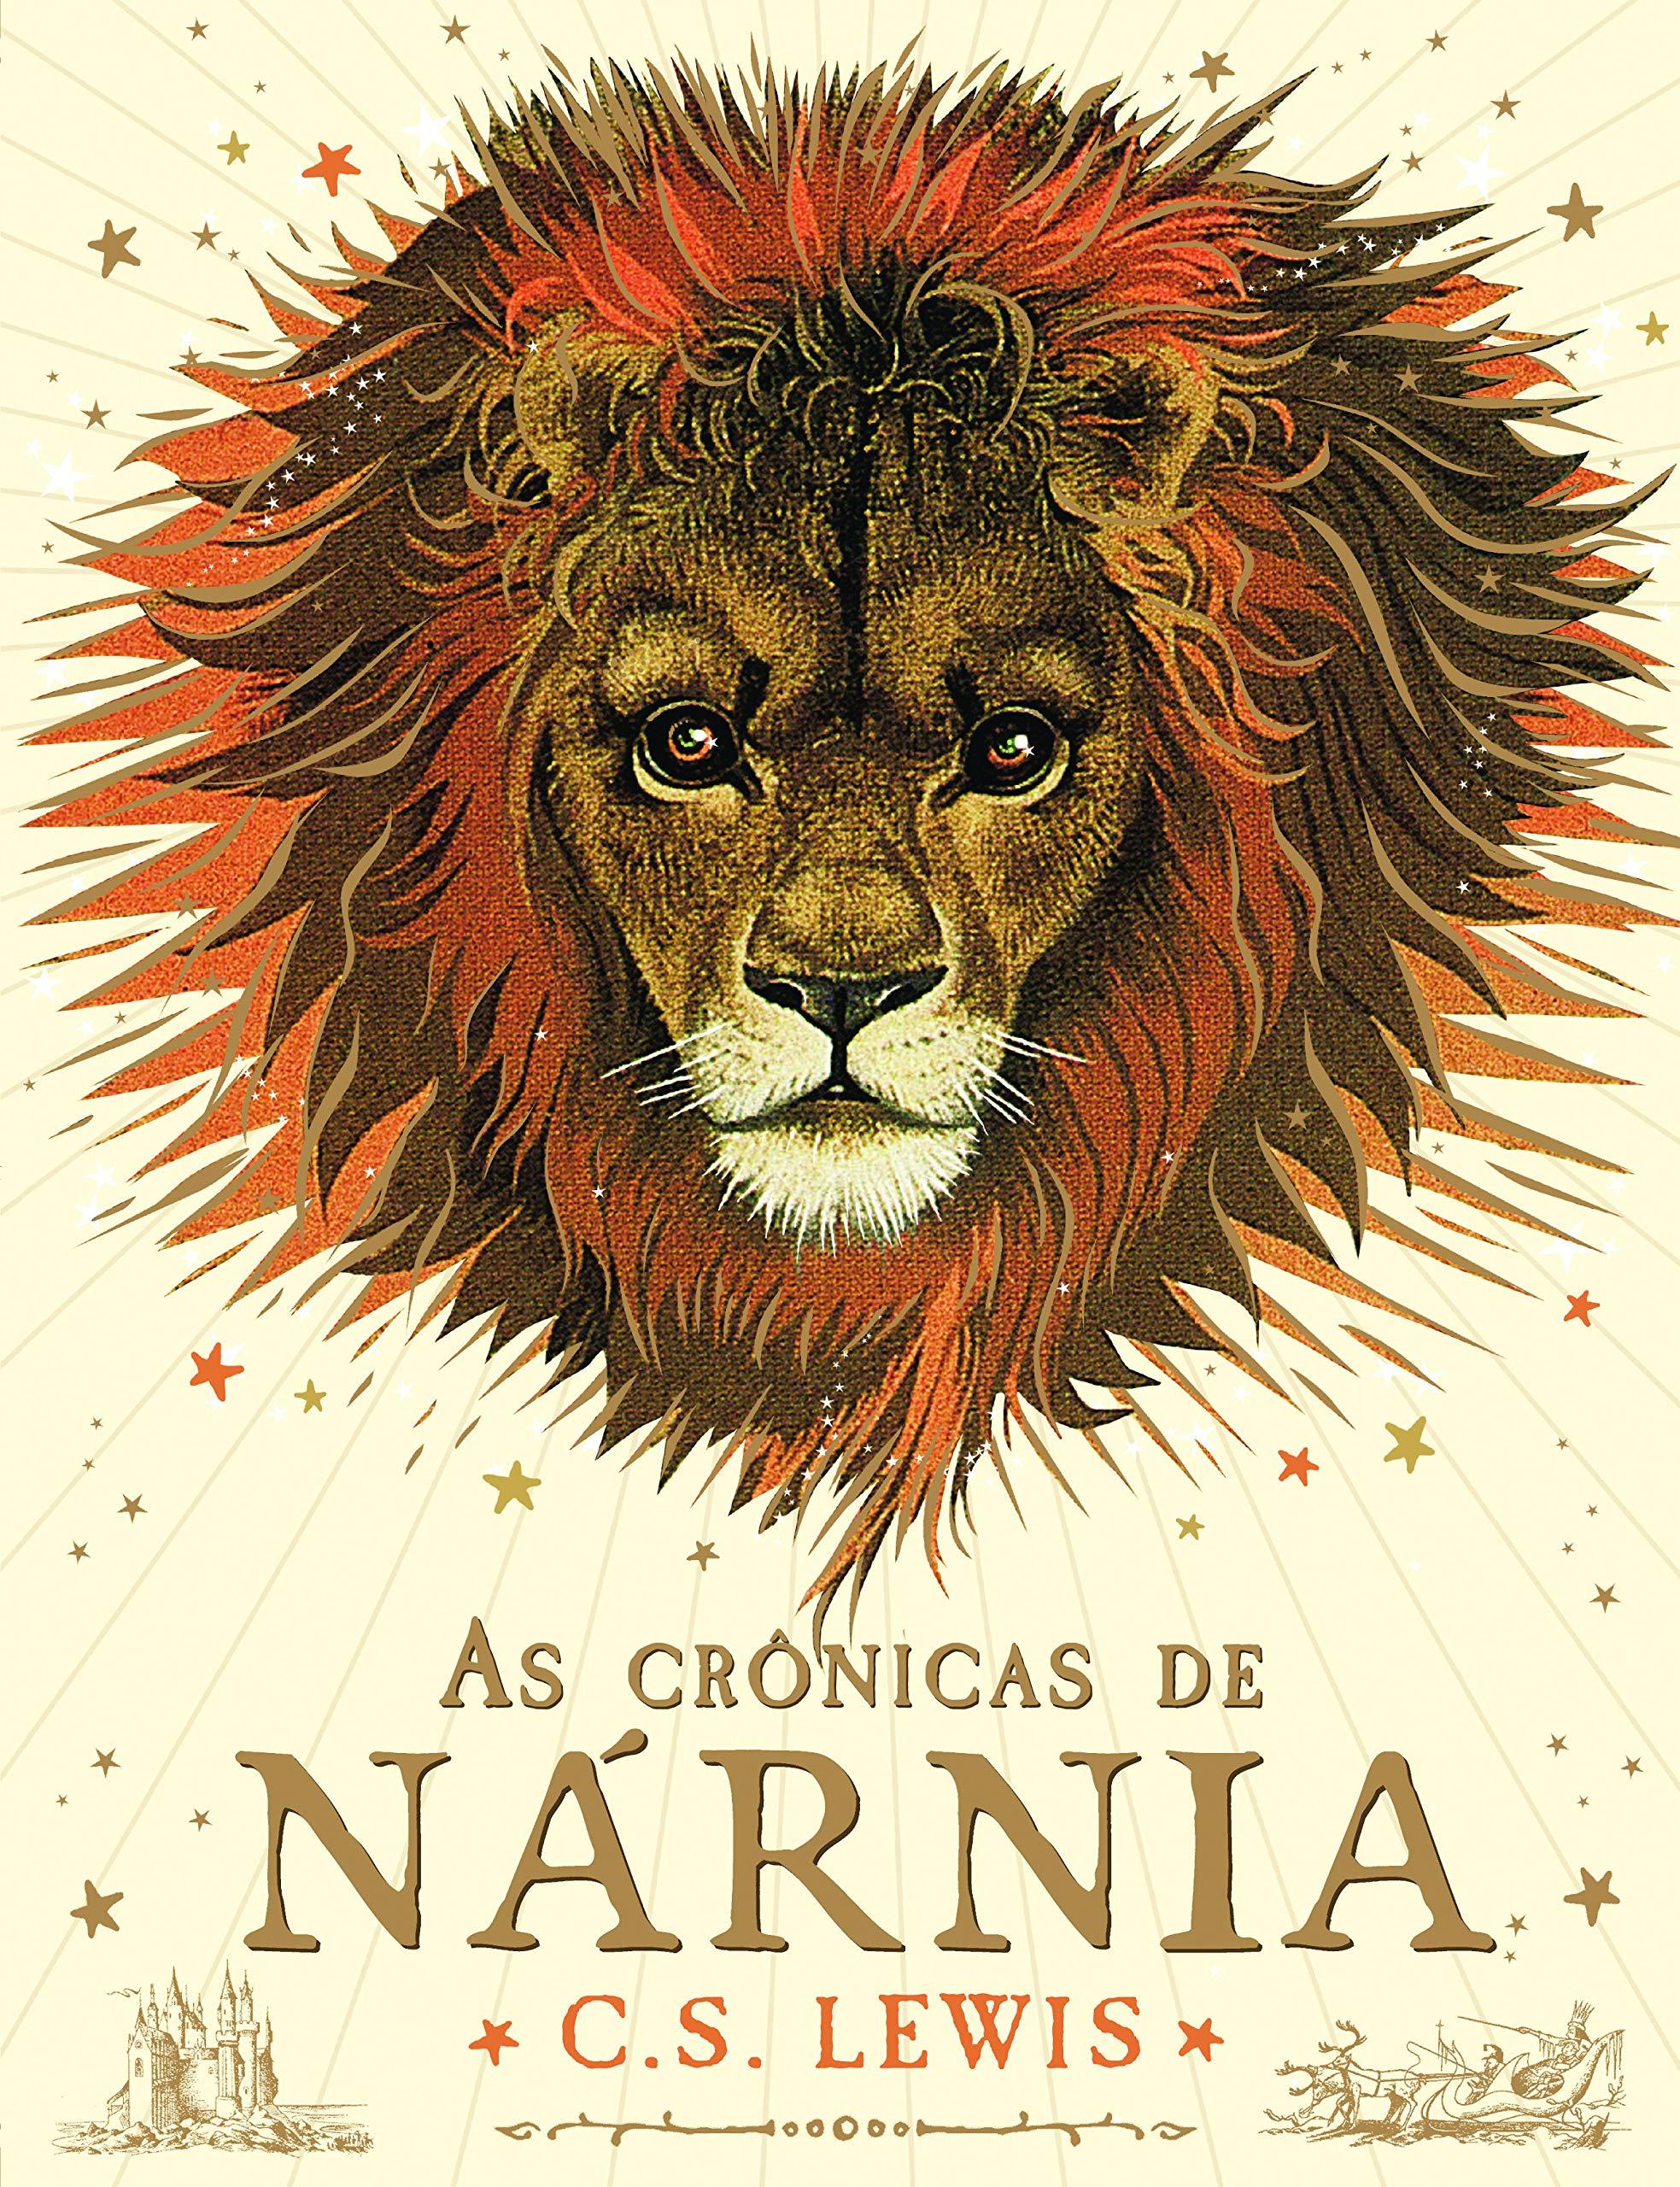 As crônicas de Nárnia: Volume único ilustrado